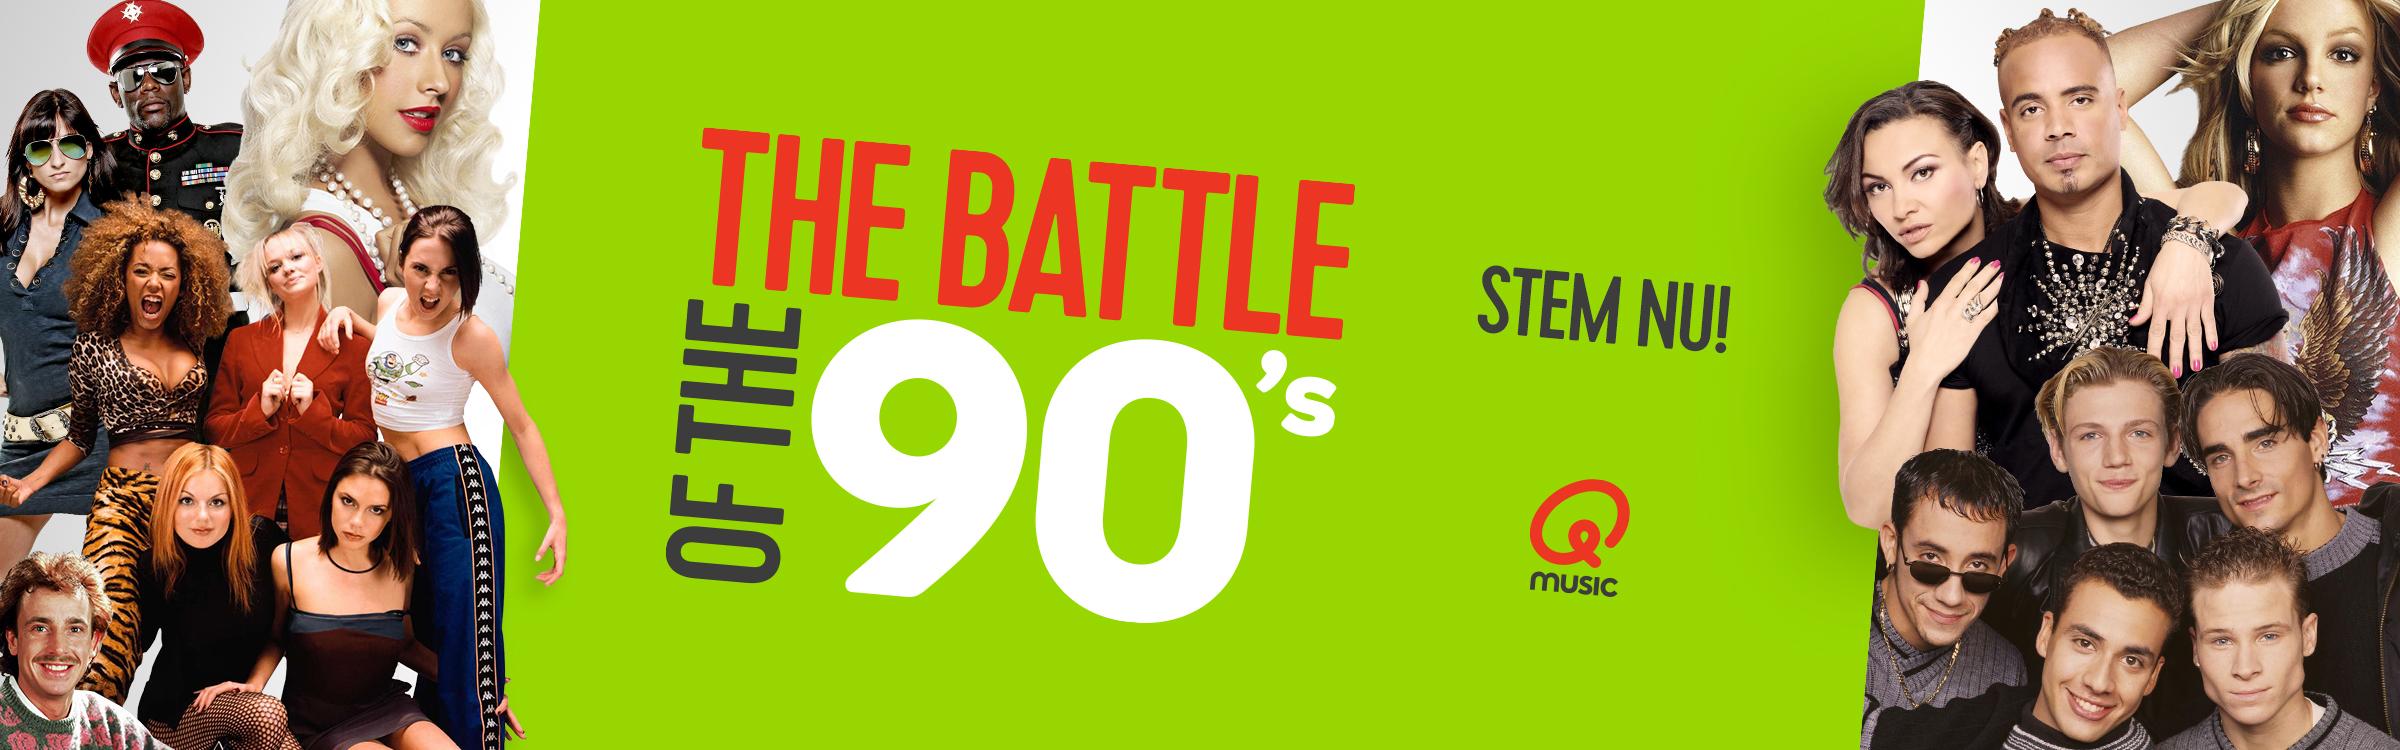 Qmusic actionheader top500 90s battles